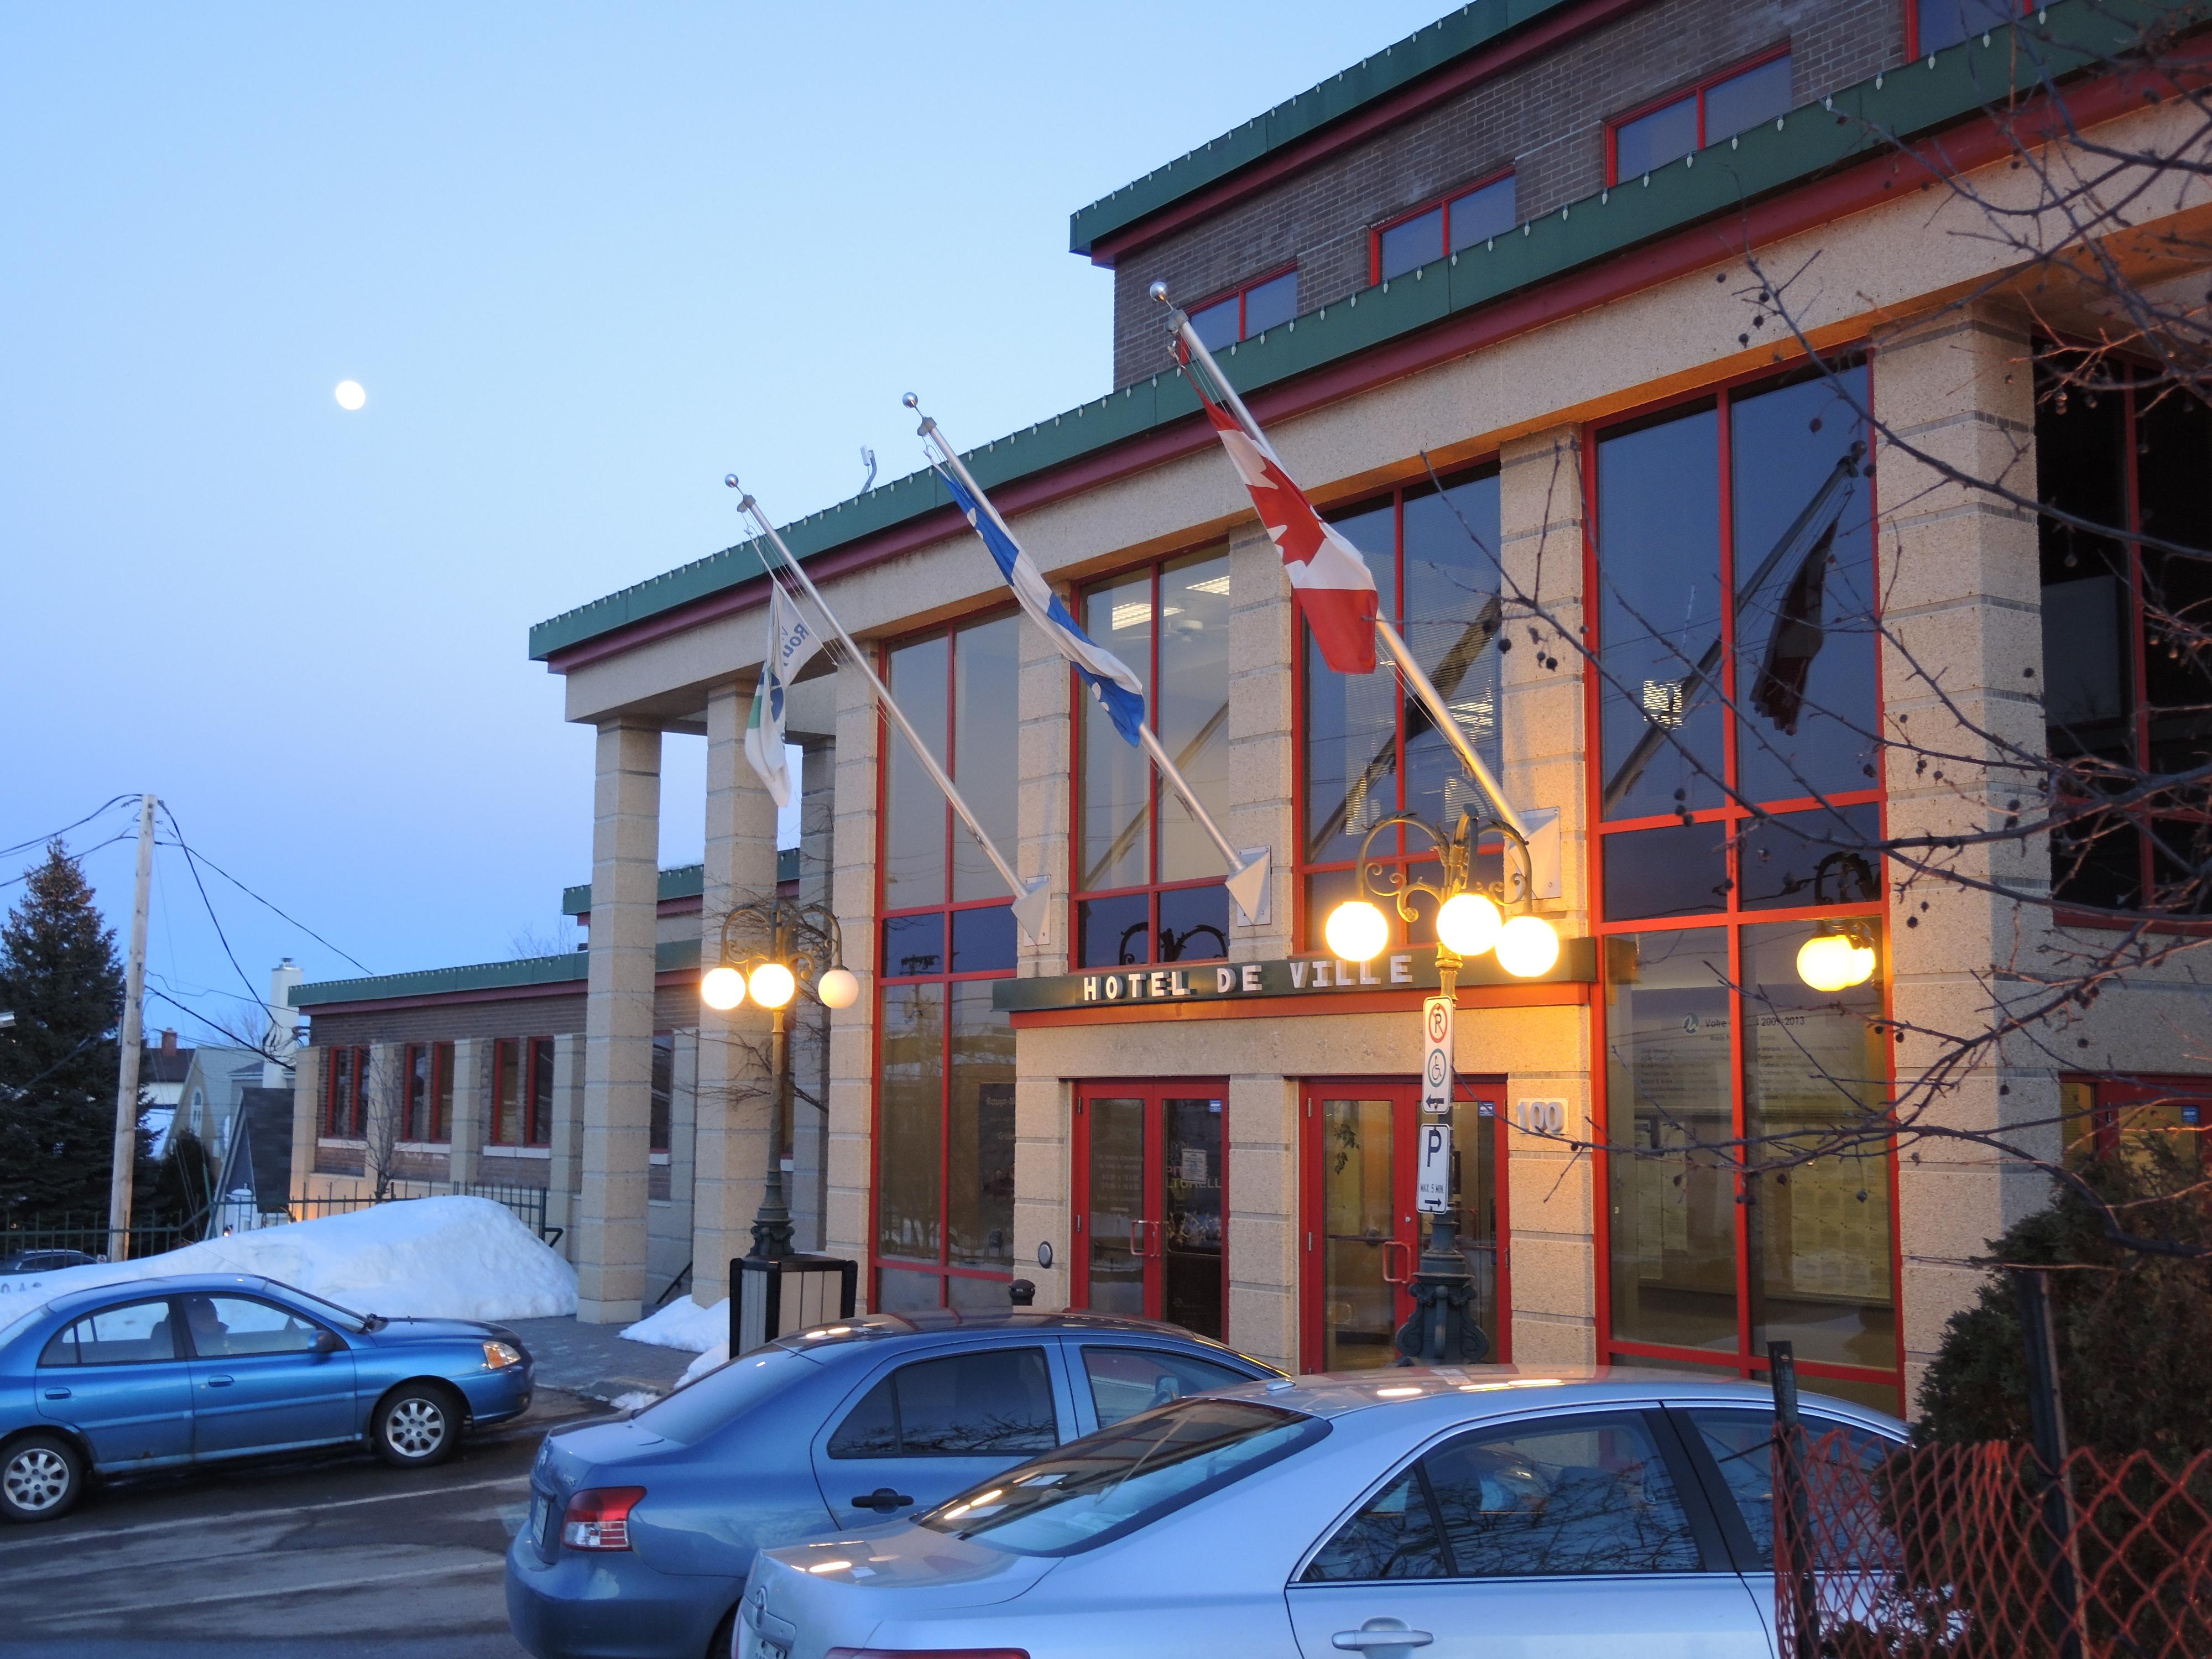 Hôtel de ville Rouyn-Noranda